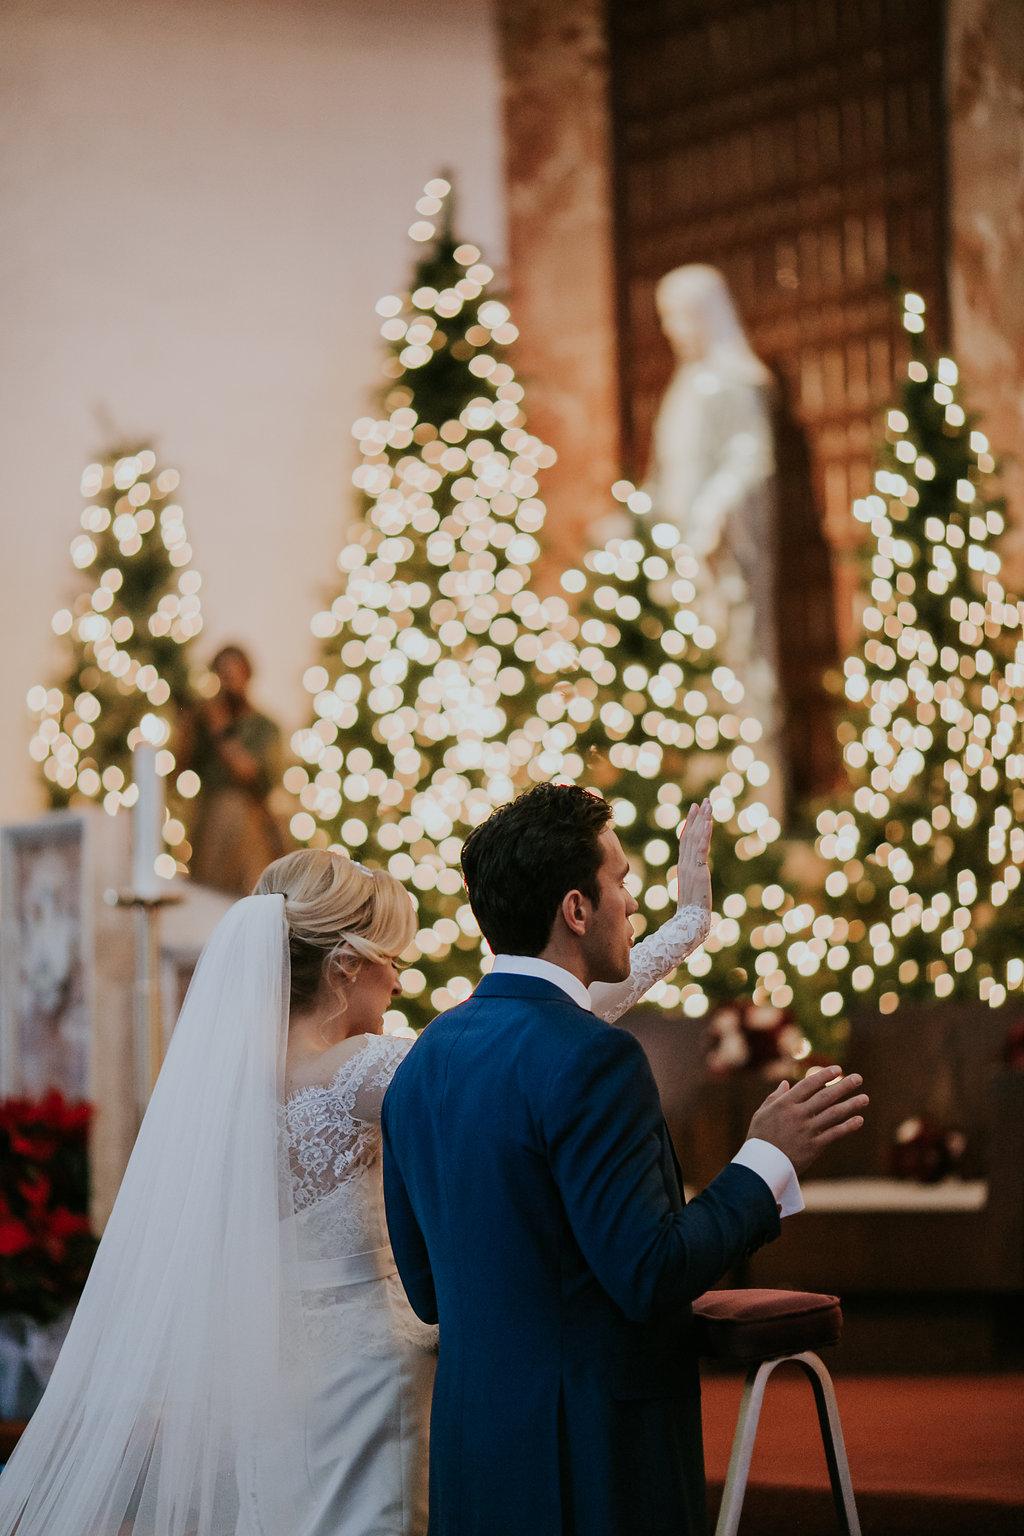 Five Distinctively Catholic Ways to Celebrate Christmas as a Couple ...